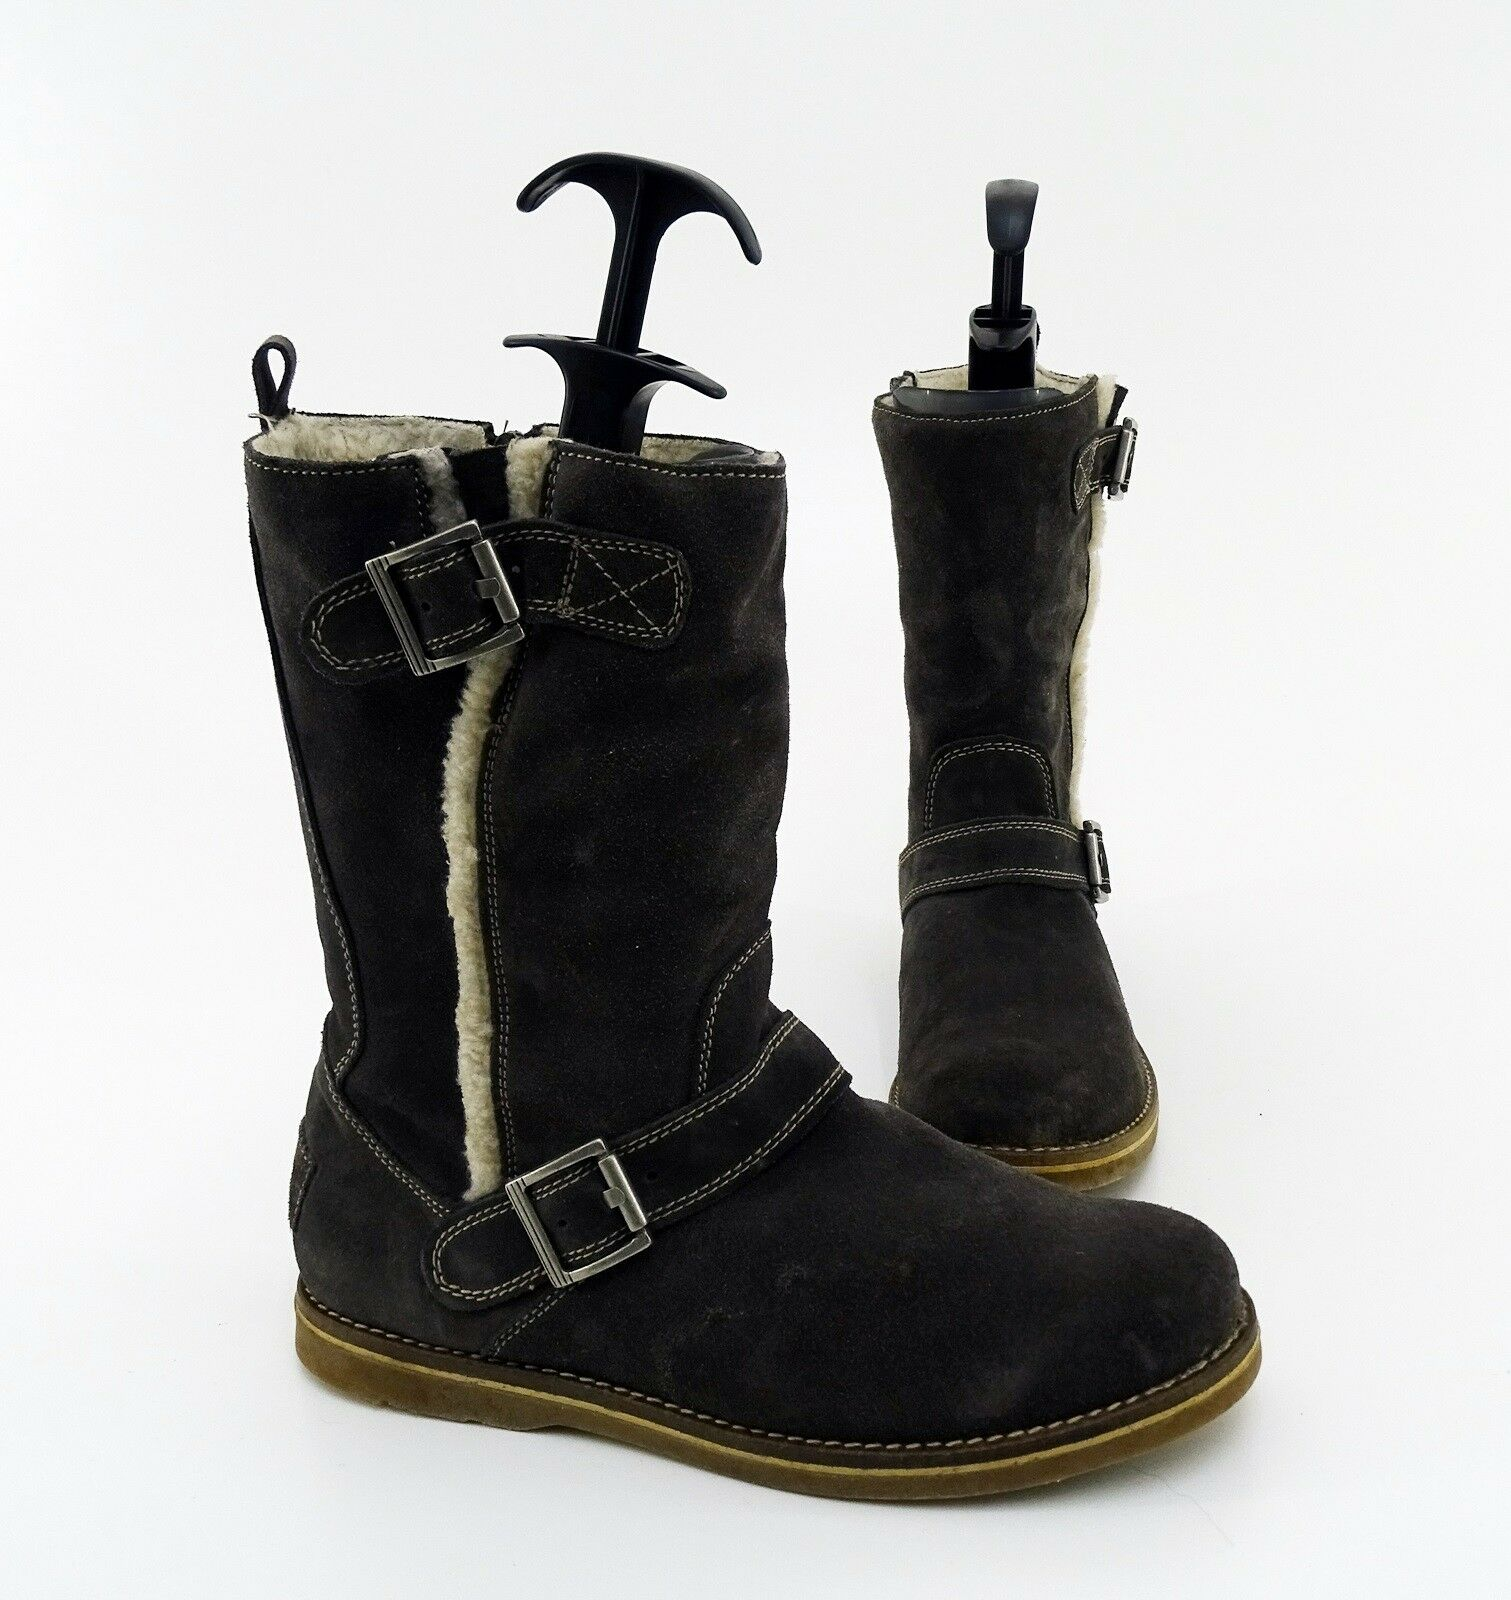 Stiefel Tamaris Winter Reißverschluss Echtleder brown Gr. 41